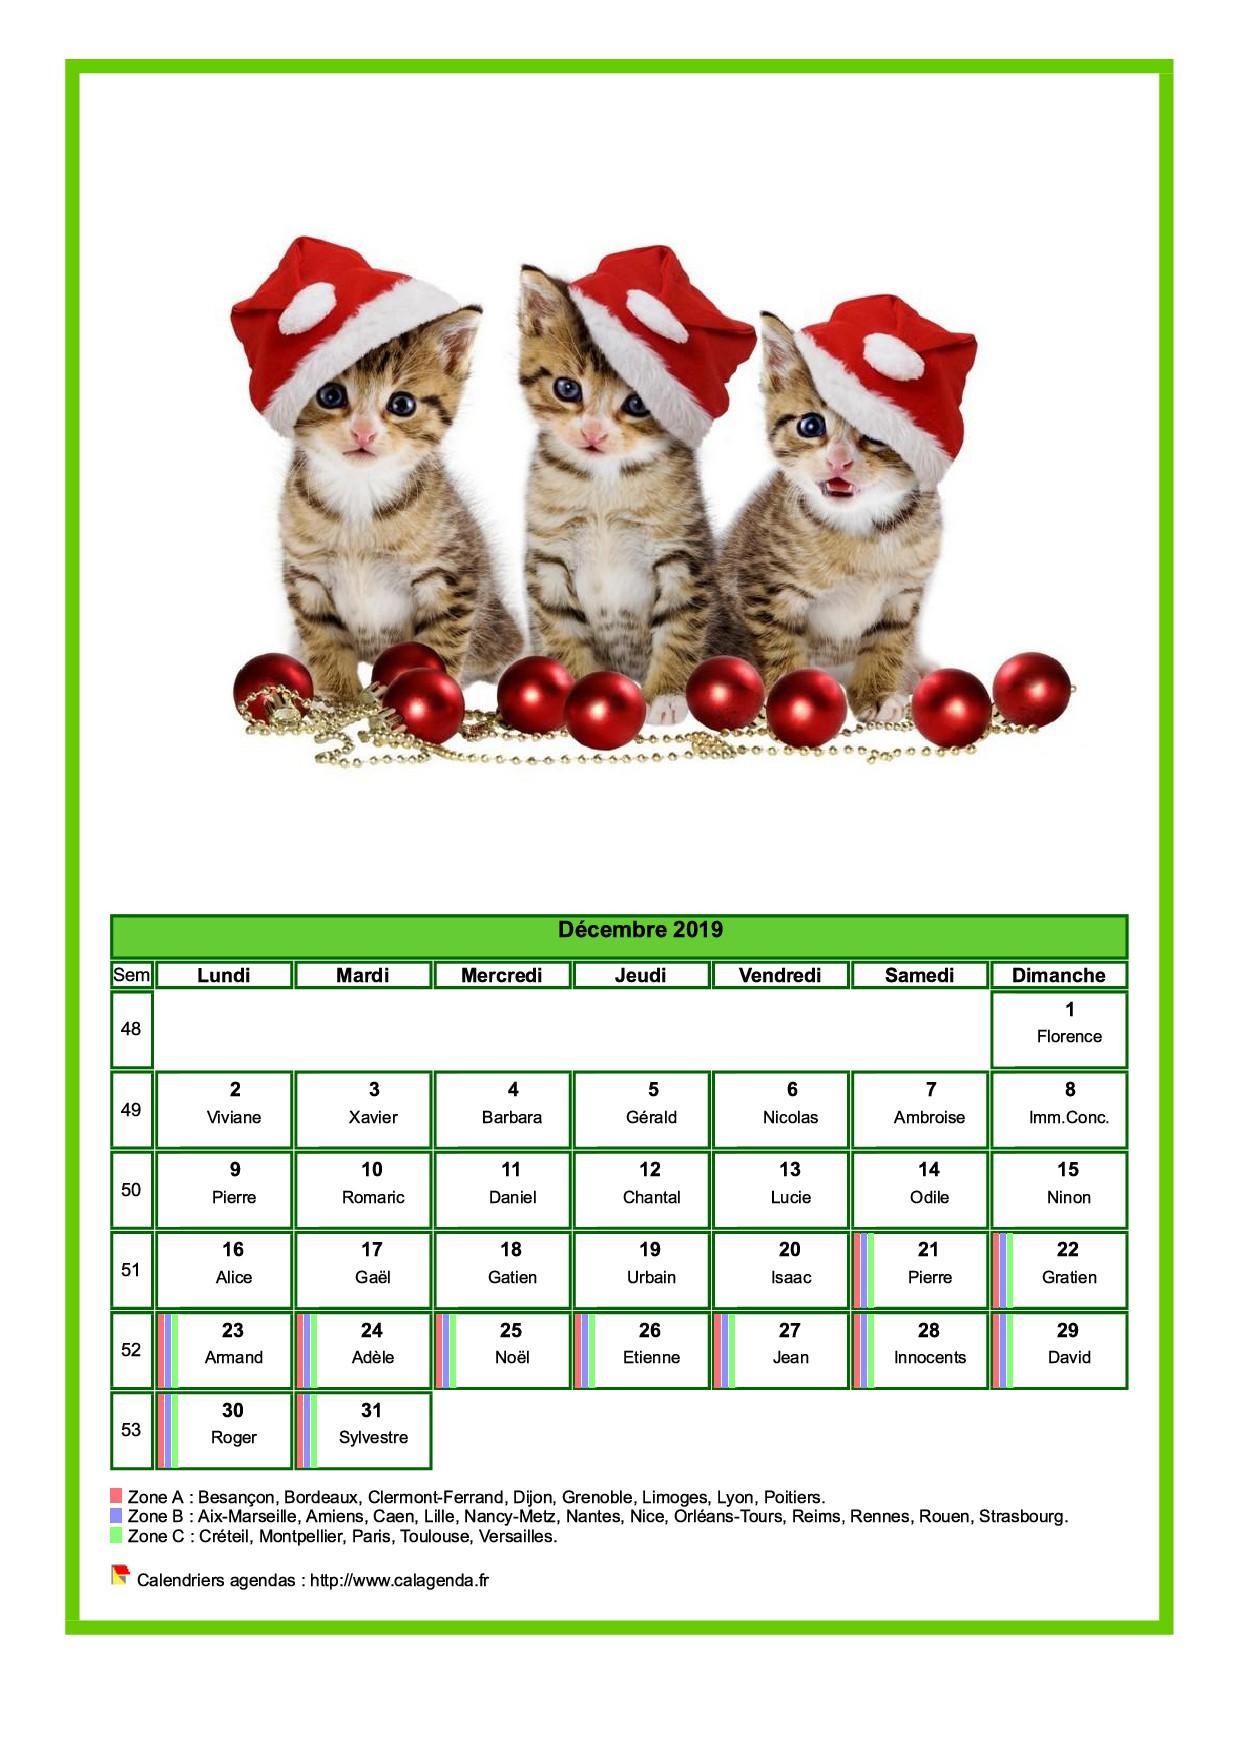 Calendrier Mensuel Decembre 2019.Calendrier Decembre 2019 Chats